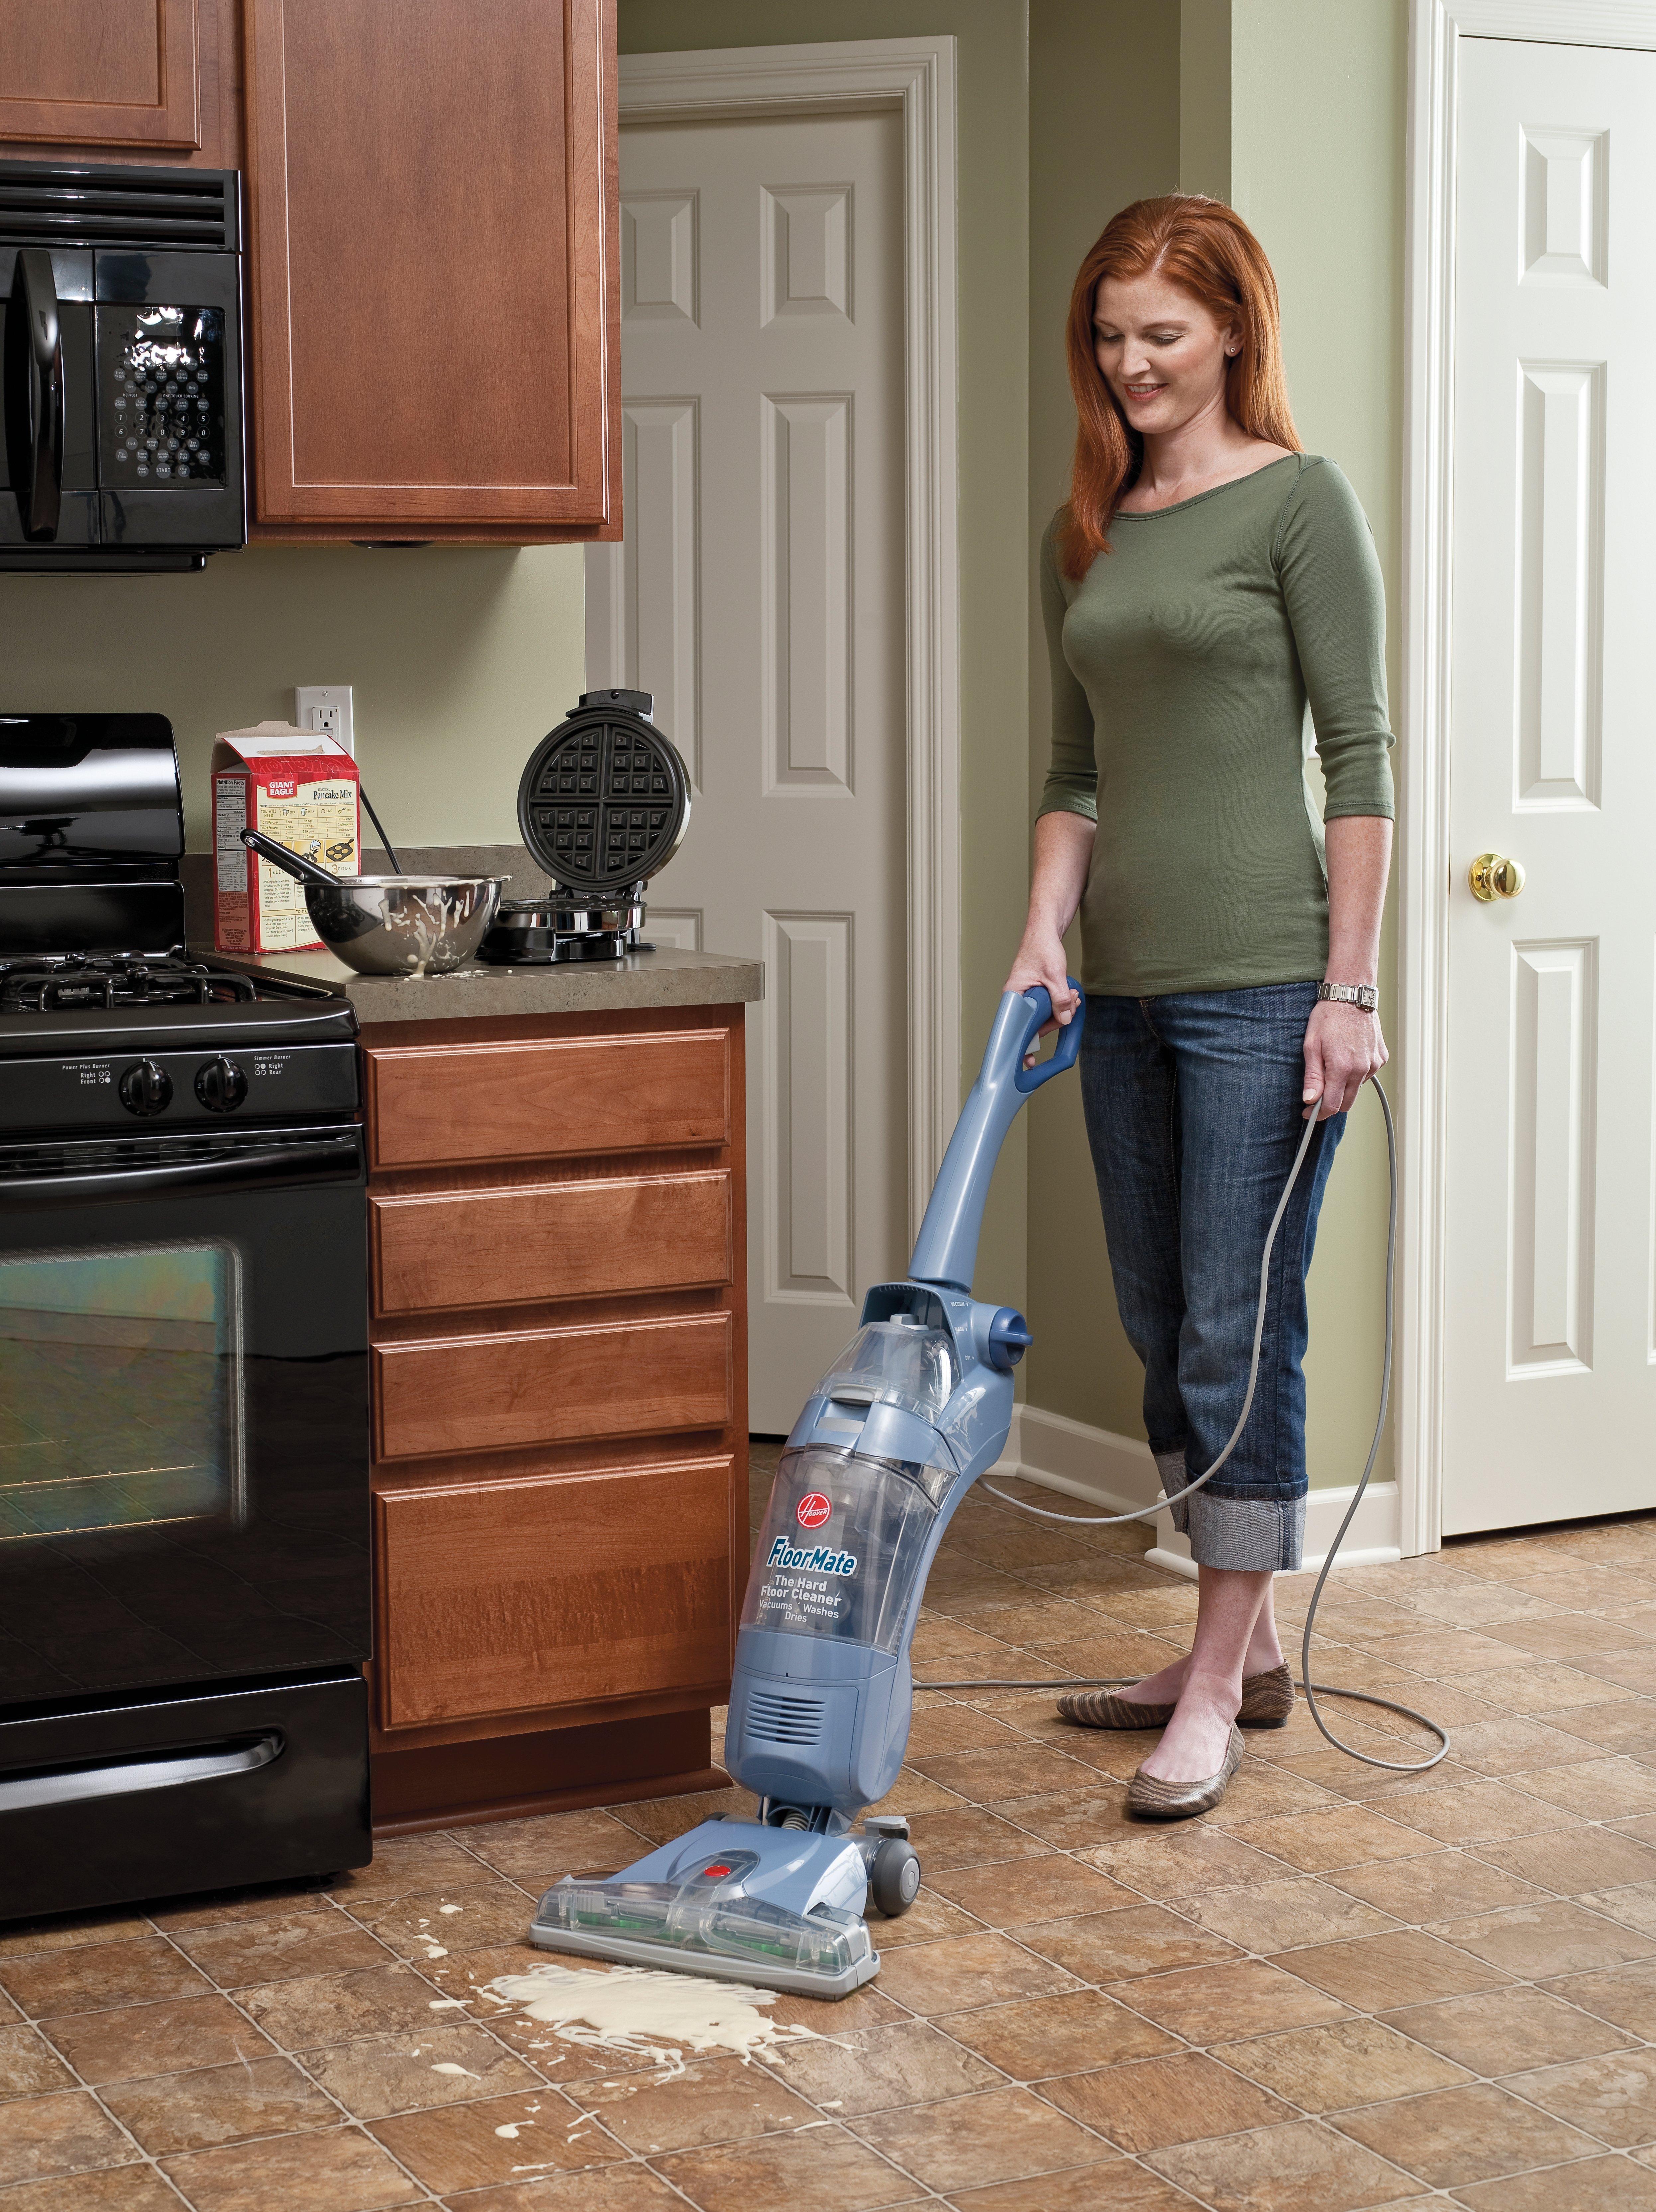 FloorMate SpinScrub 3-in-1 Hard Floor Cleaner6